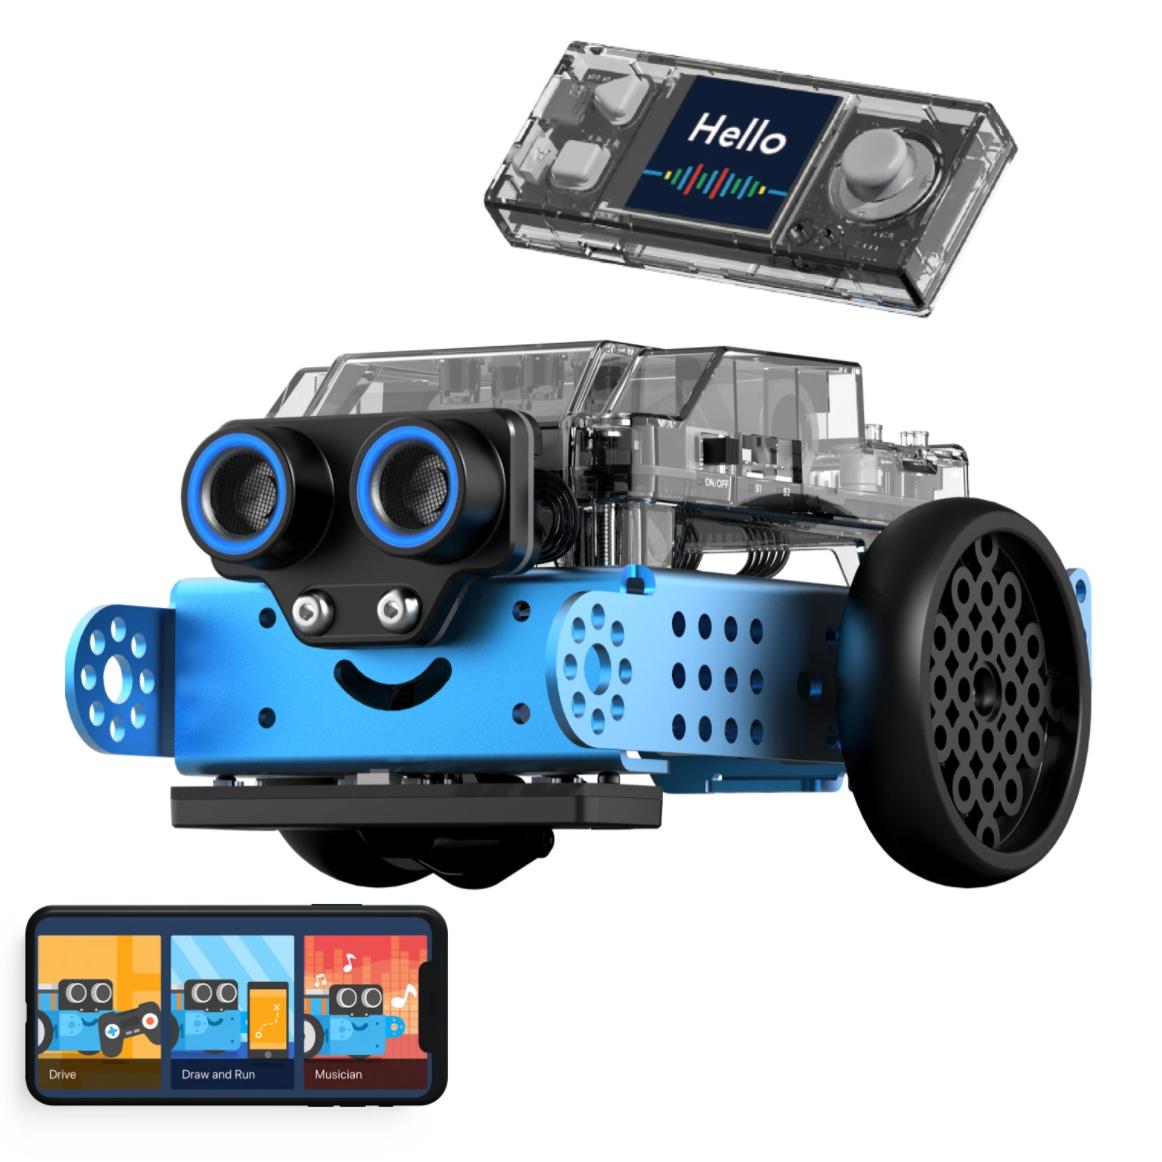 MakeBlock mBot Neo 2.0 kit